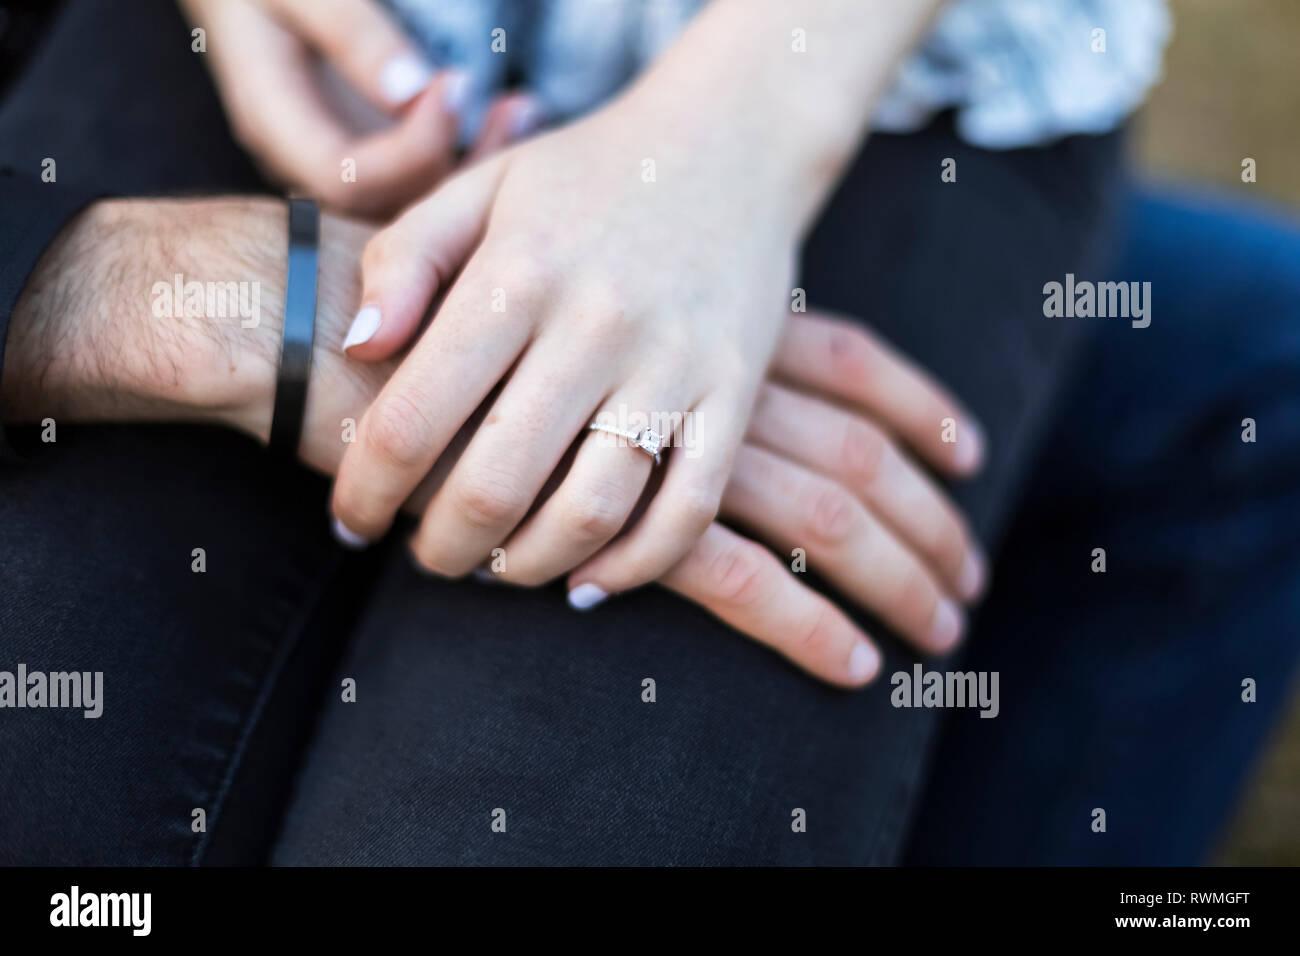 Engagement photo showing the engagement ring on the female's hand; Bothell, Washington, United States of America - Stock Image